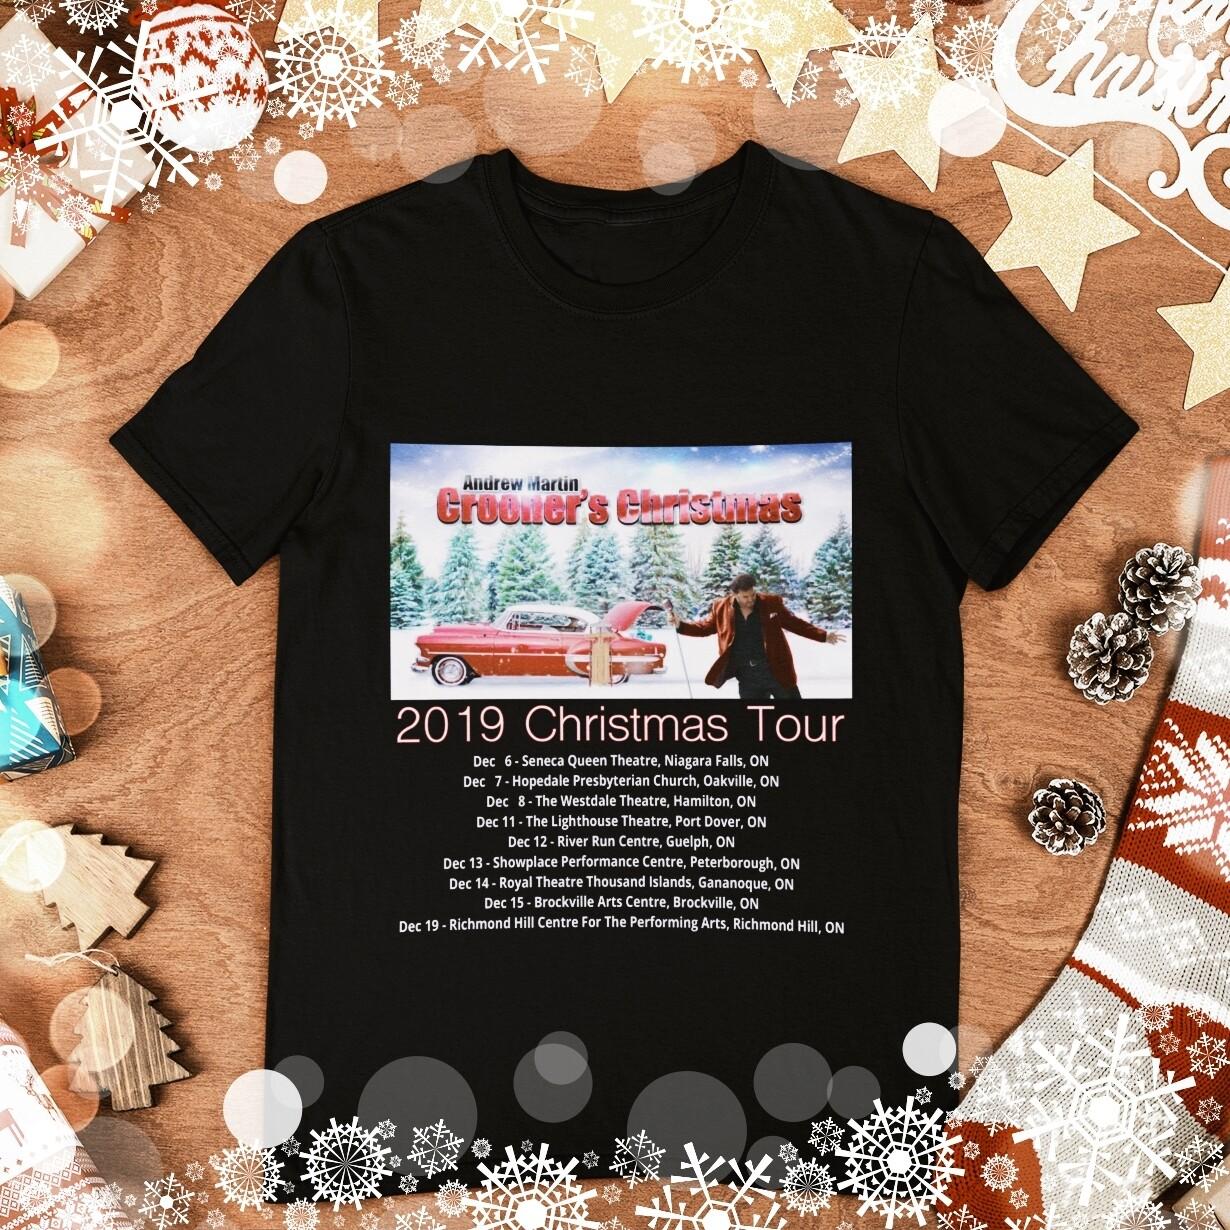 2019 Crooner's Christmas Tour T-Shirt